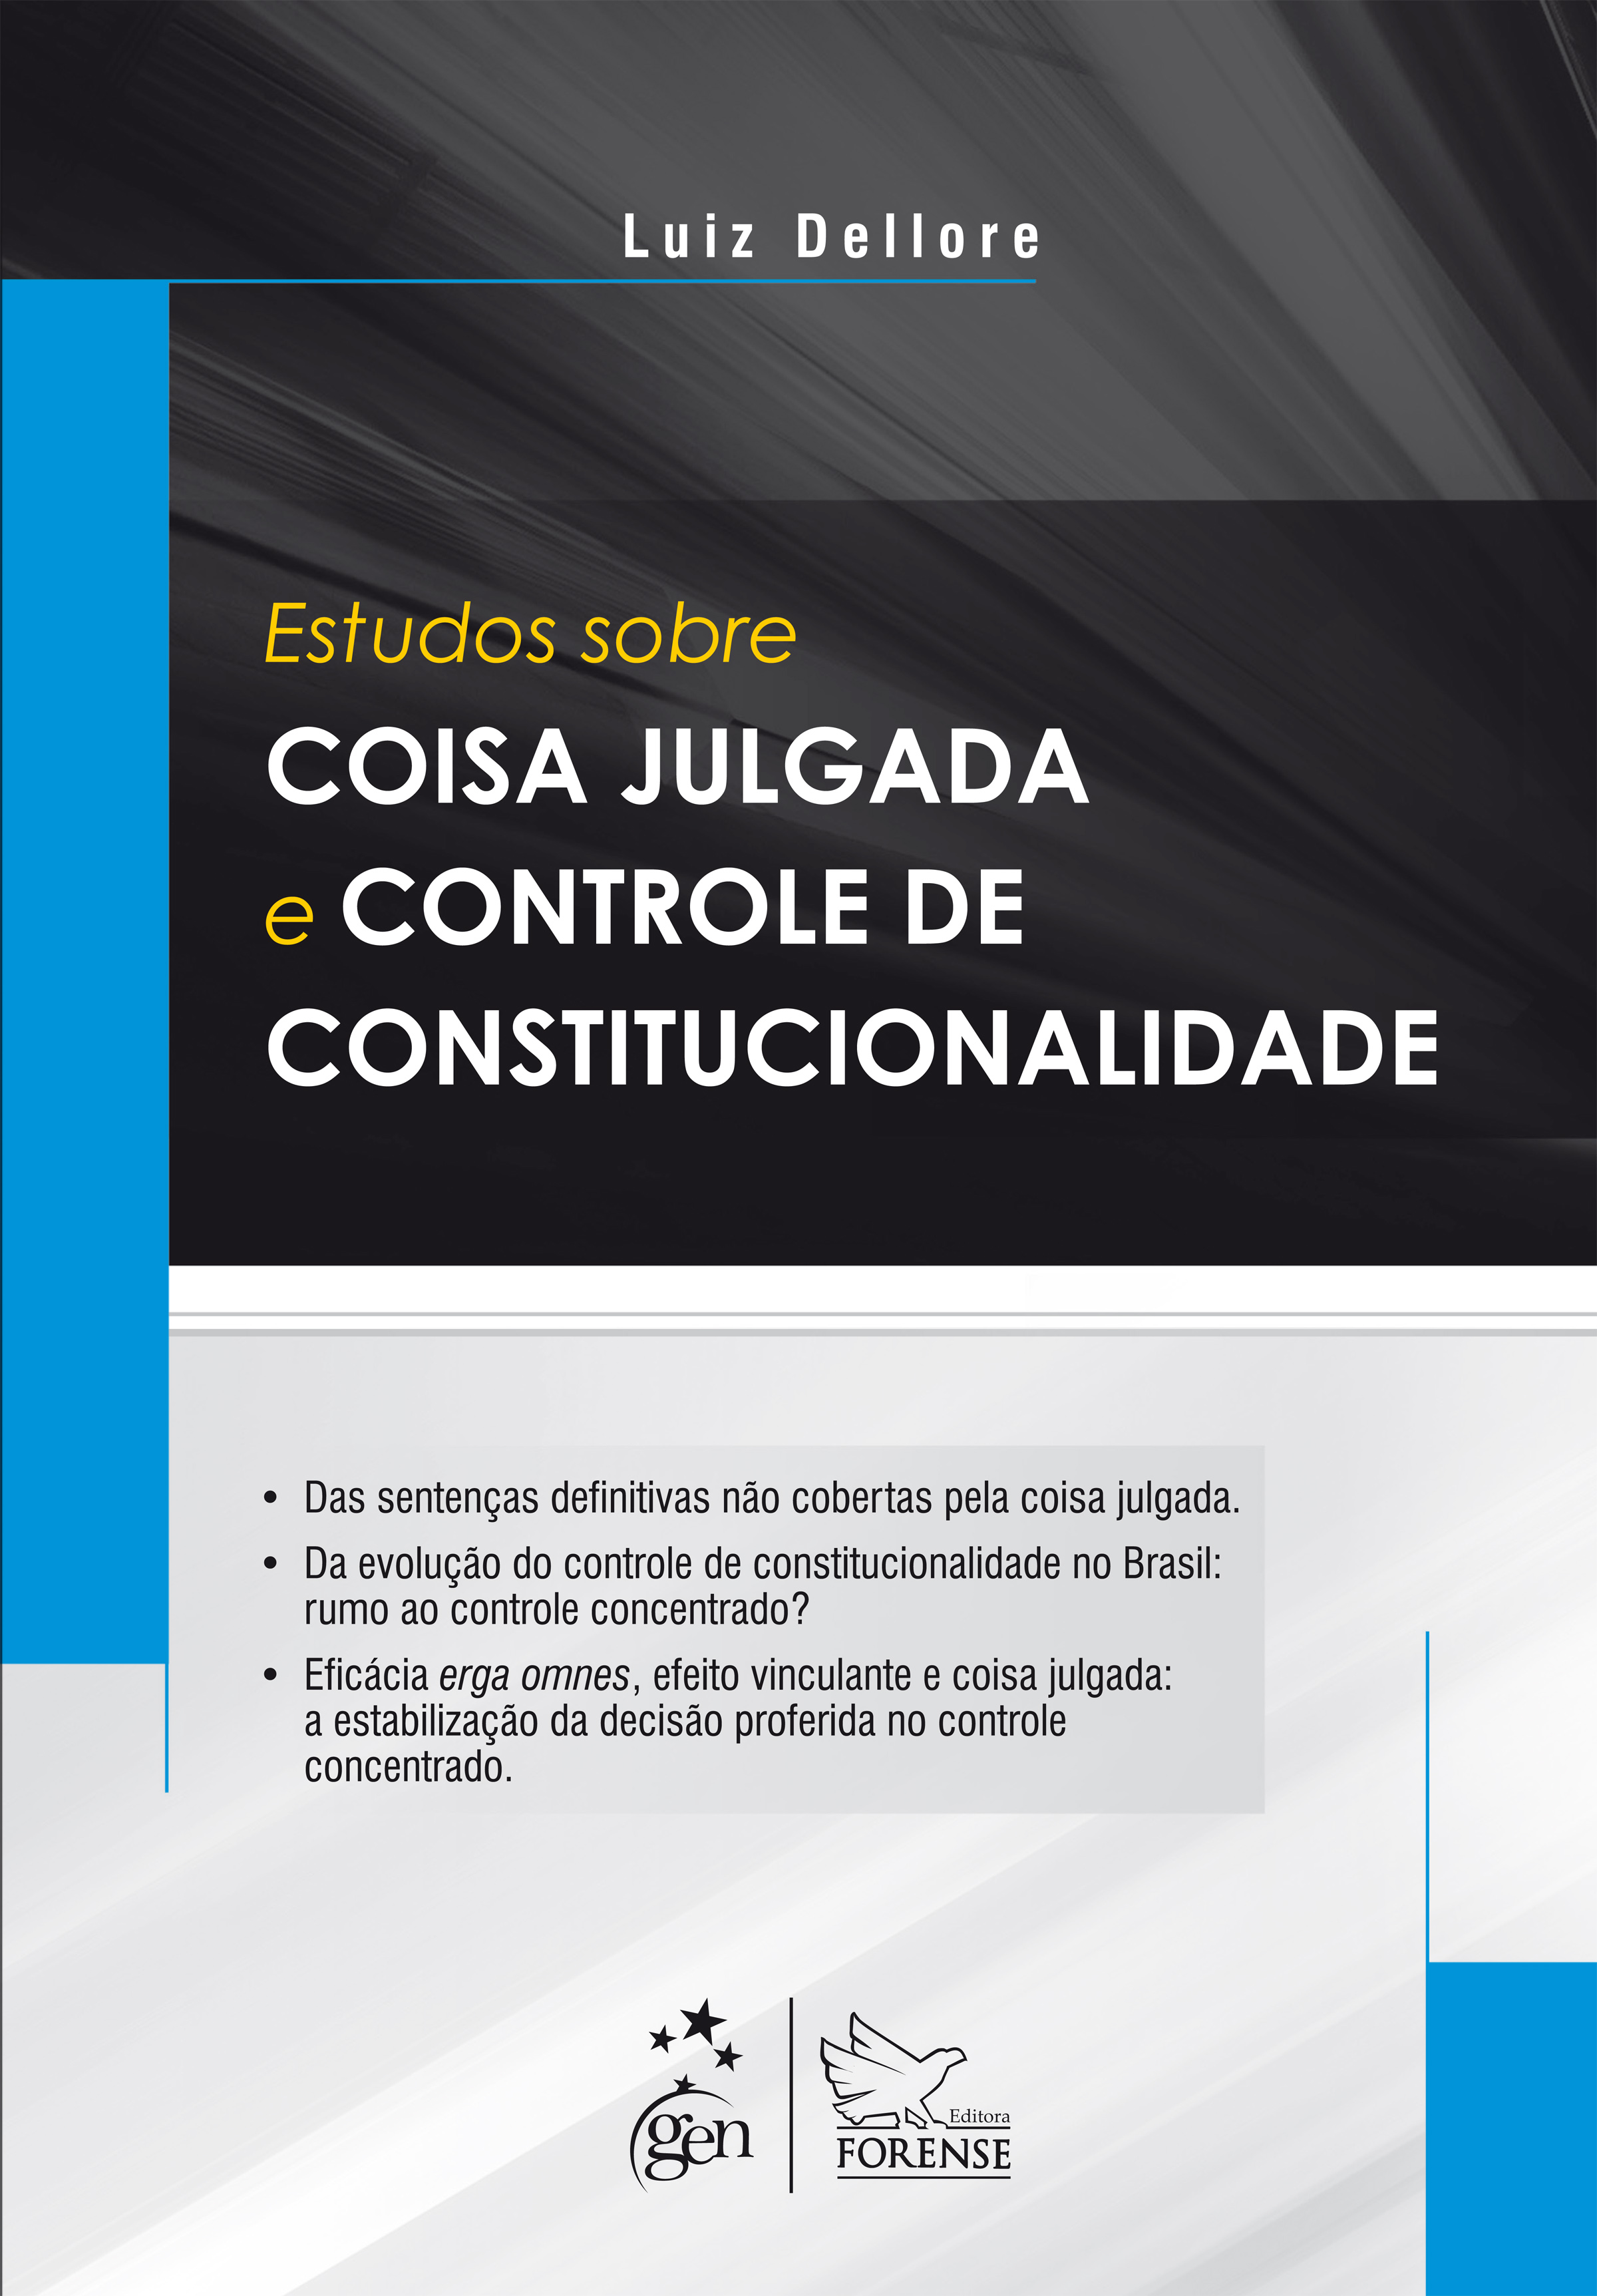 Estudos_sobre_coisa_julgada.indd